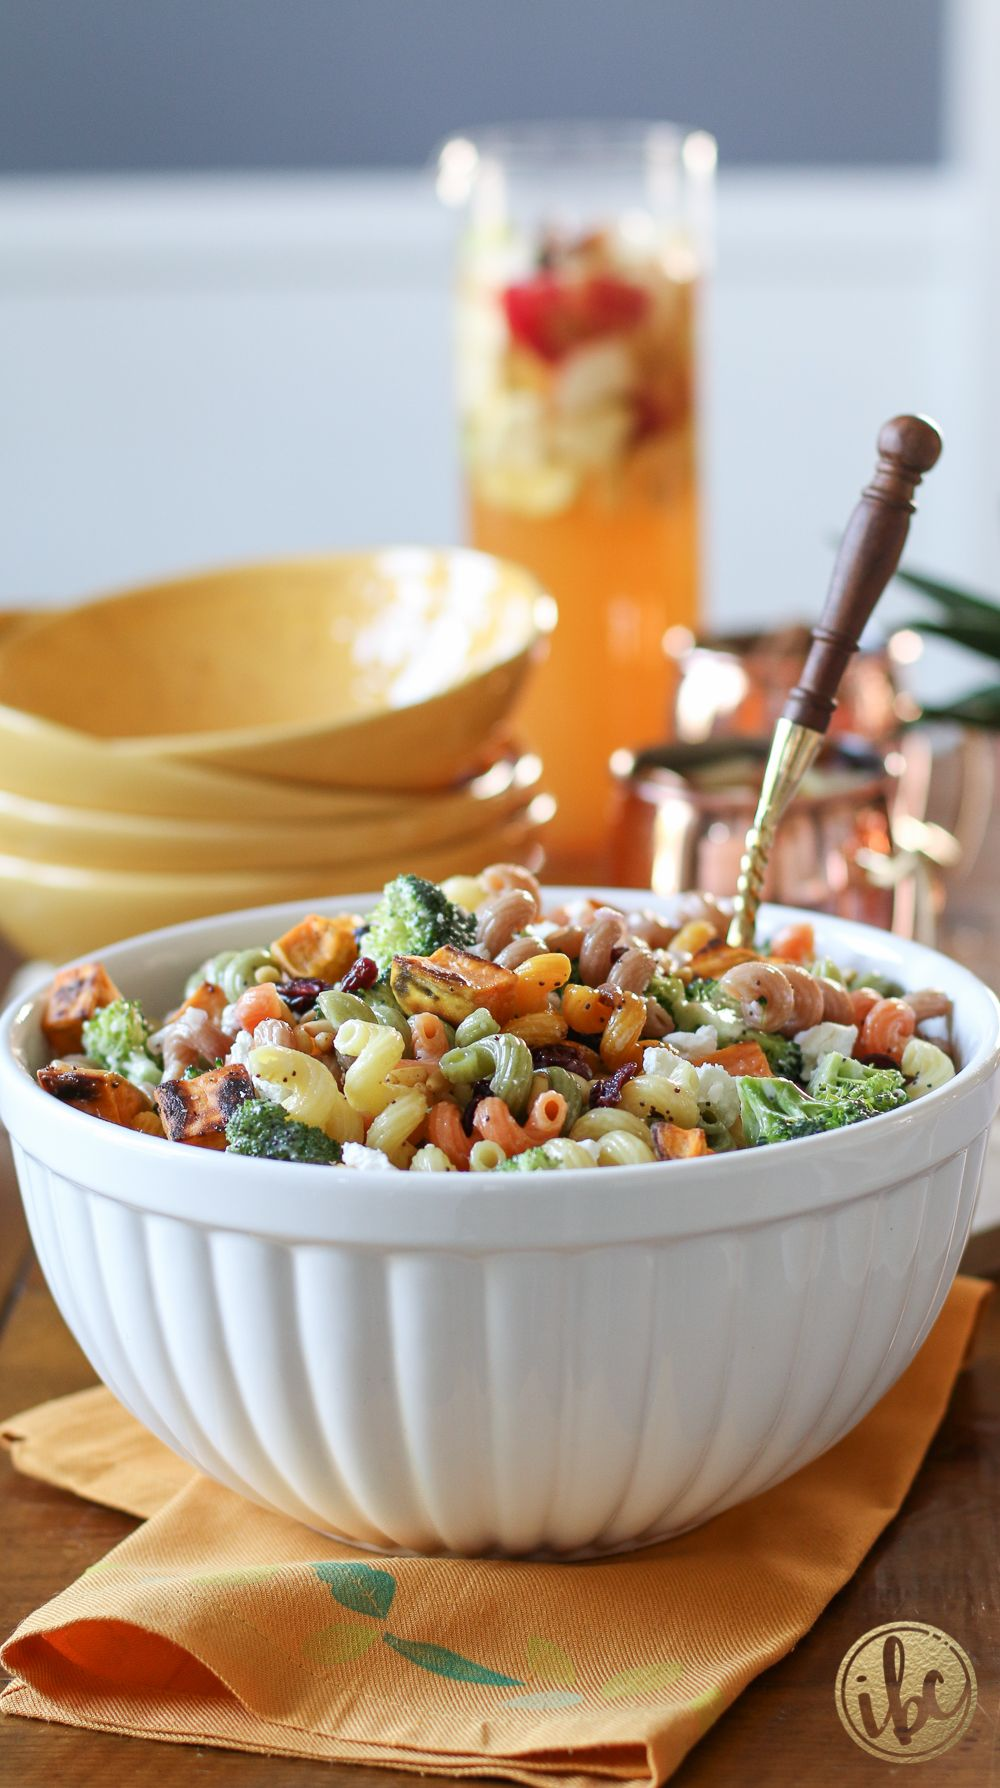 Fall Pasta Dinner: Delicious Fall Pasta Salad Recipe